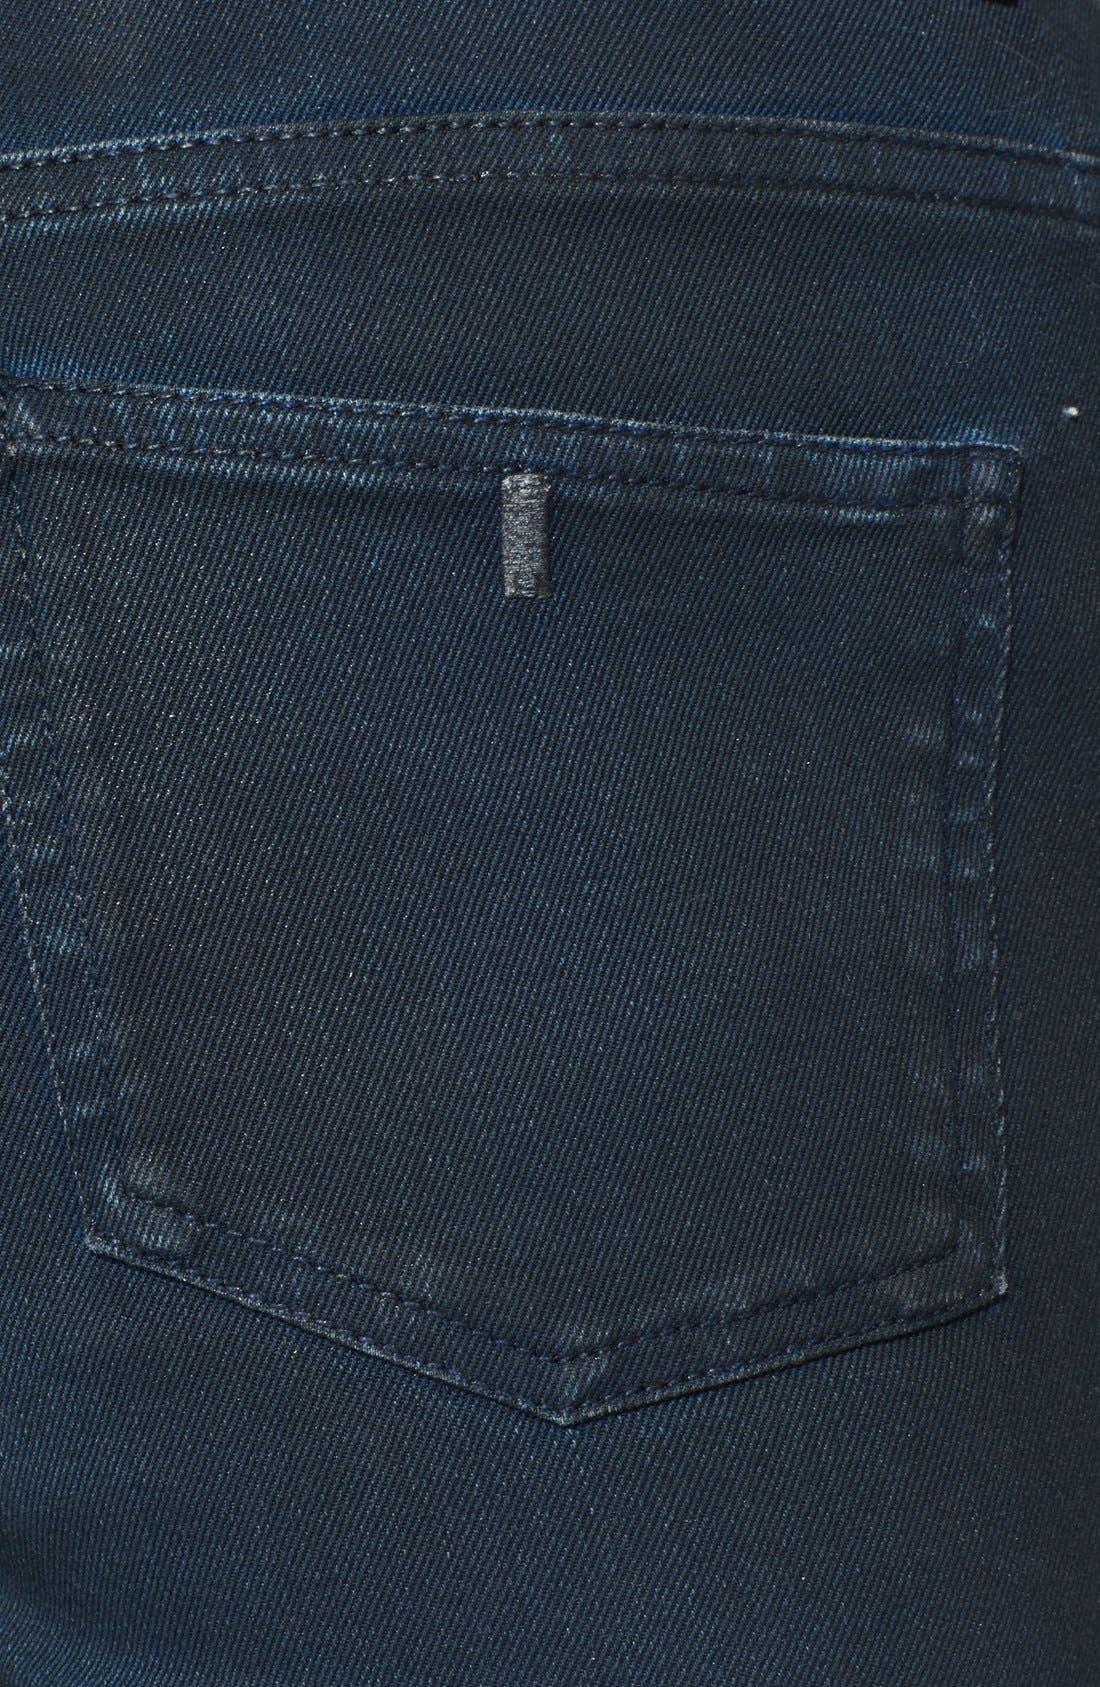 Alternate Image 3  - Stella McCartney 'The 70's Flare' Jeans